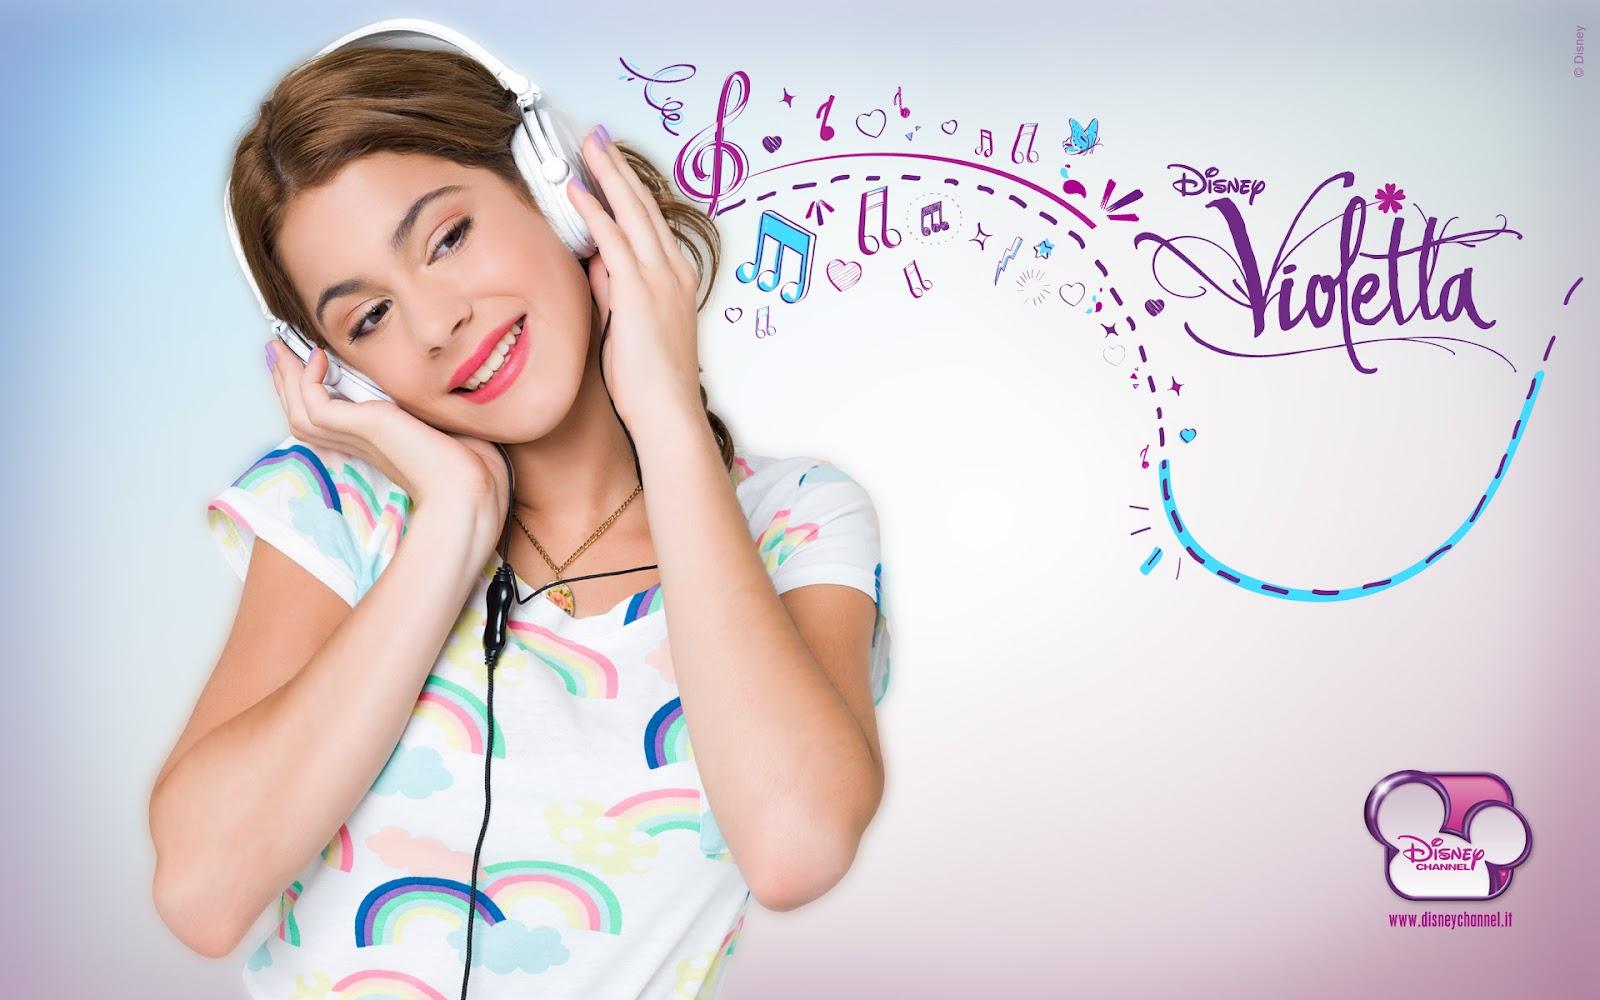 Violetta Chic Wallpaper - Violetta Chic Wallpaper